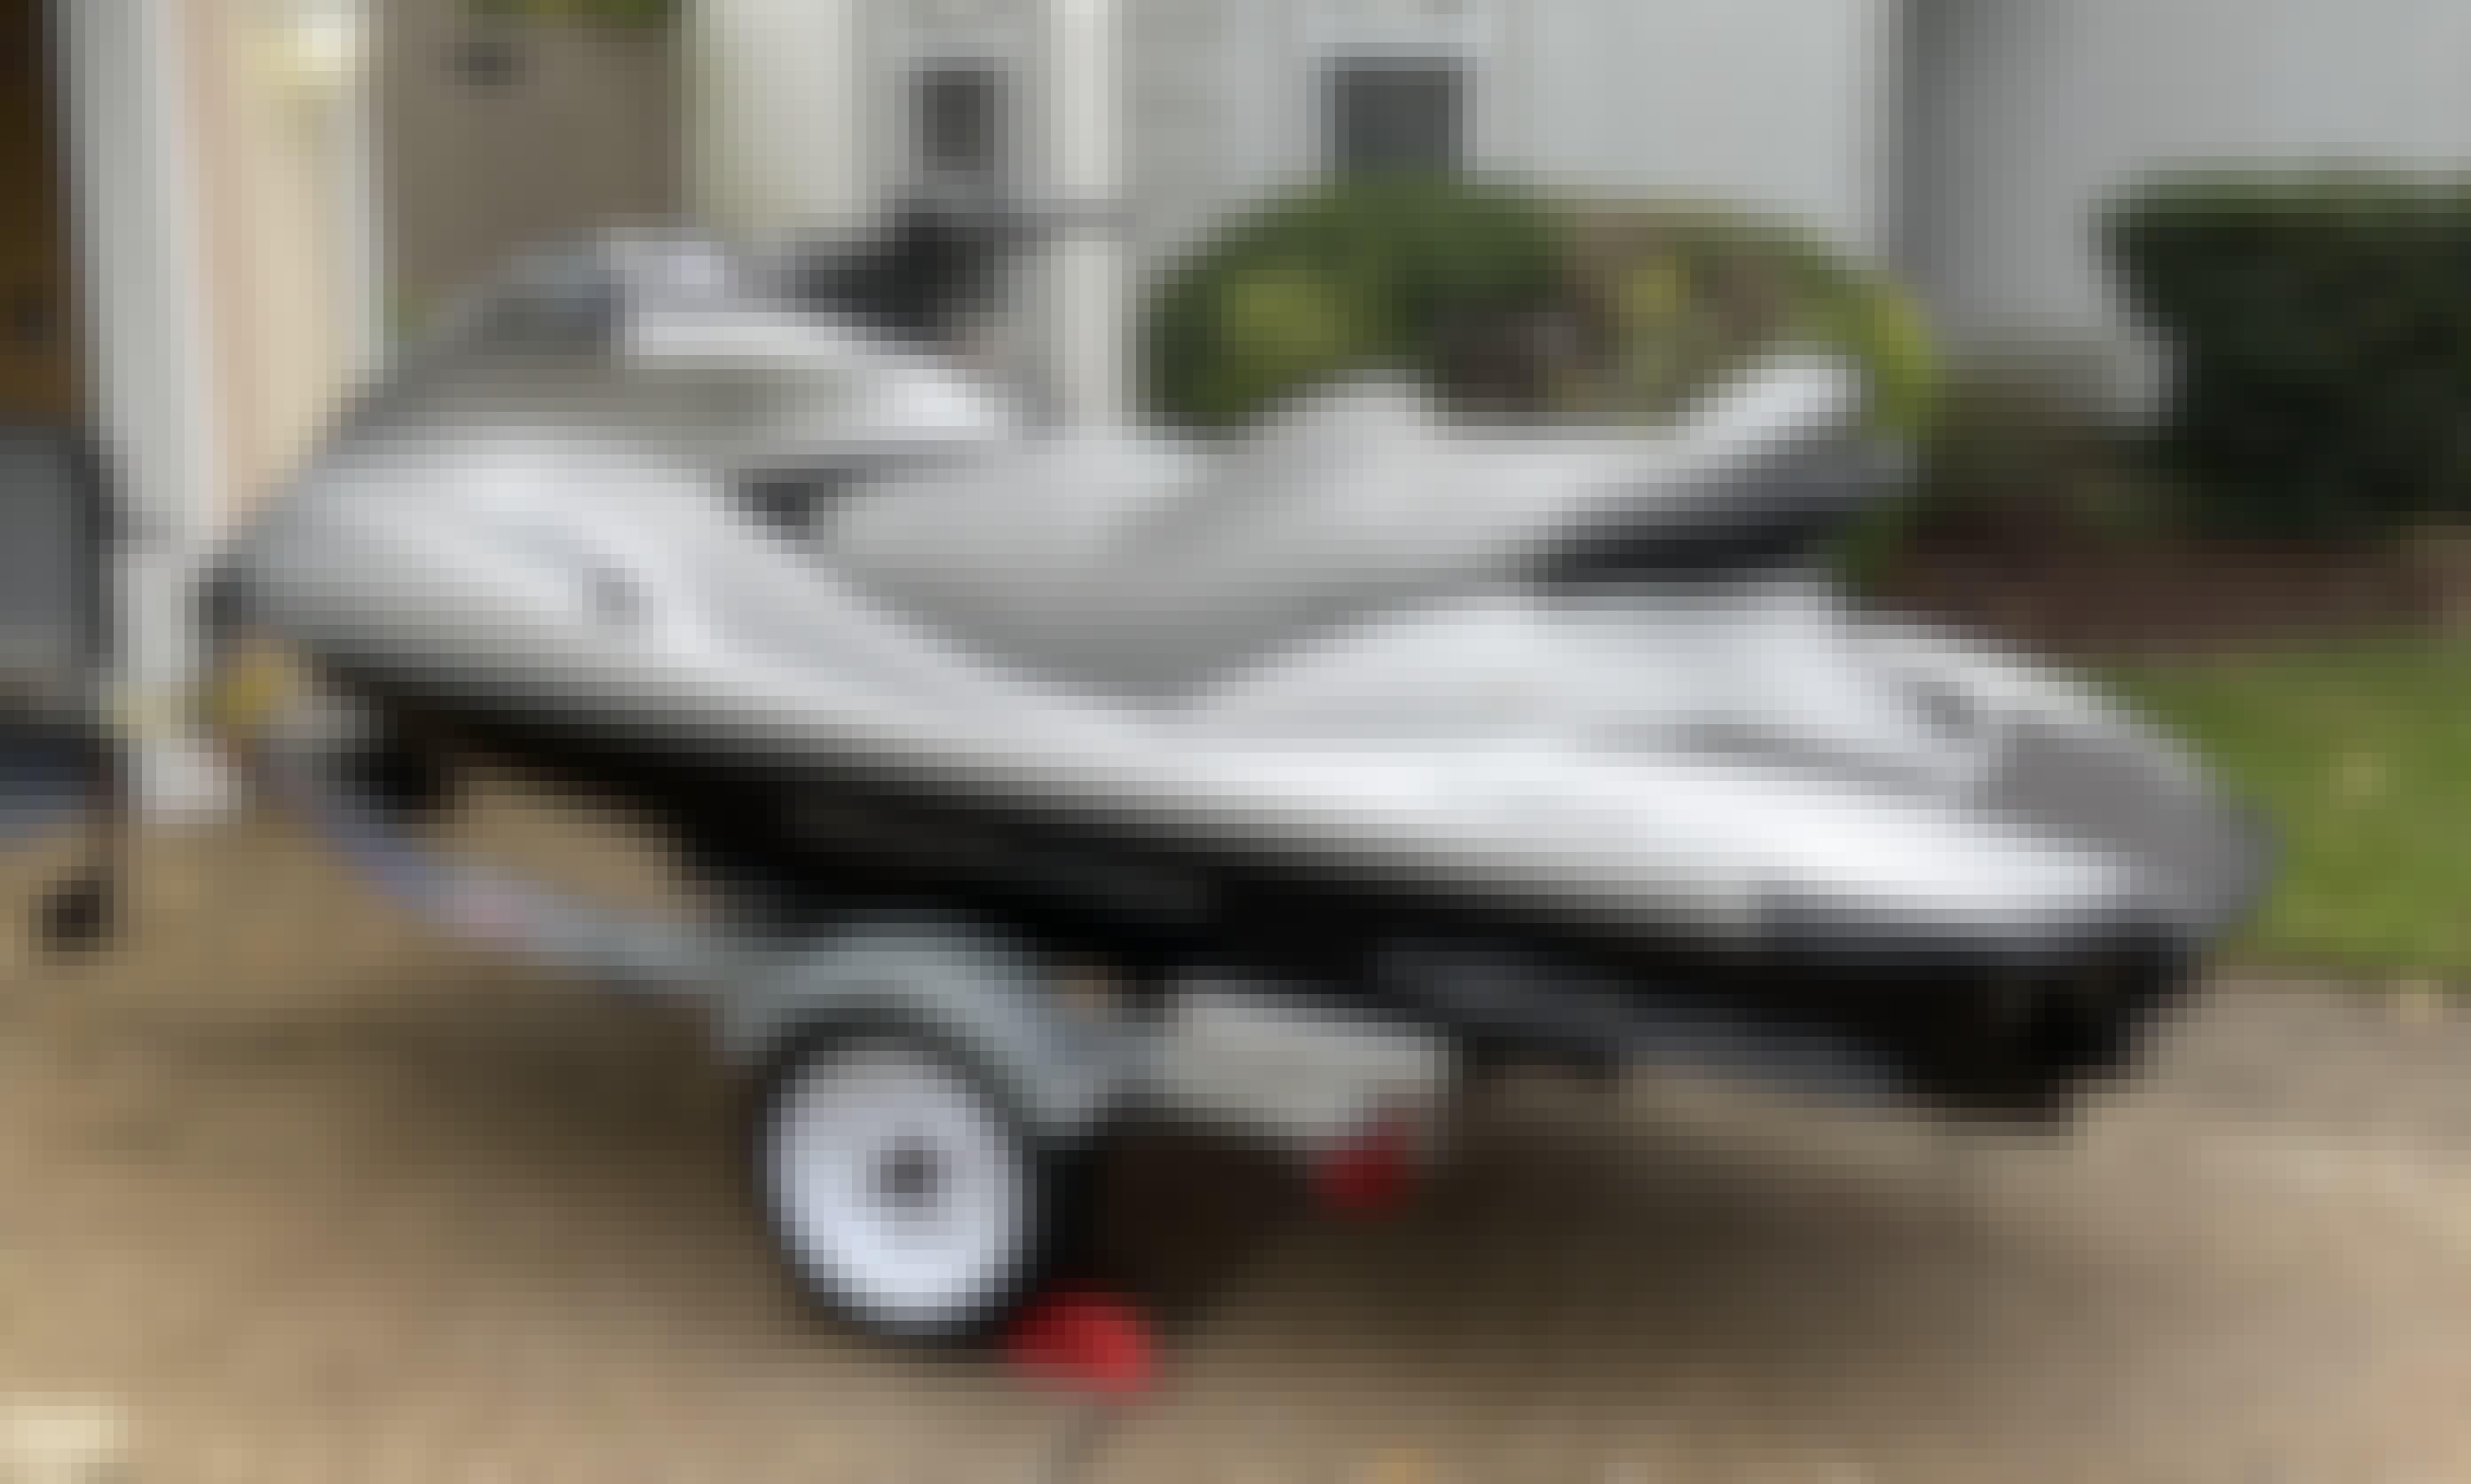 JetSki Rental in Virginia Beach